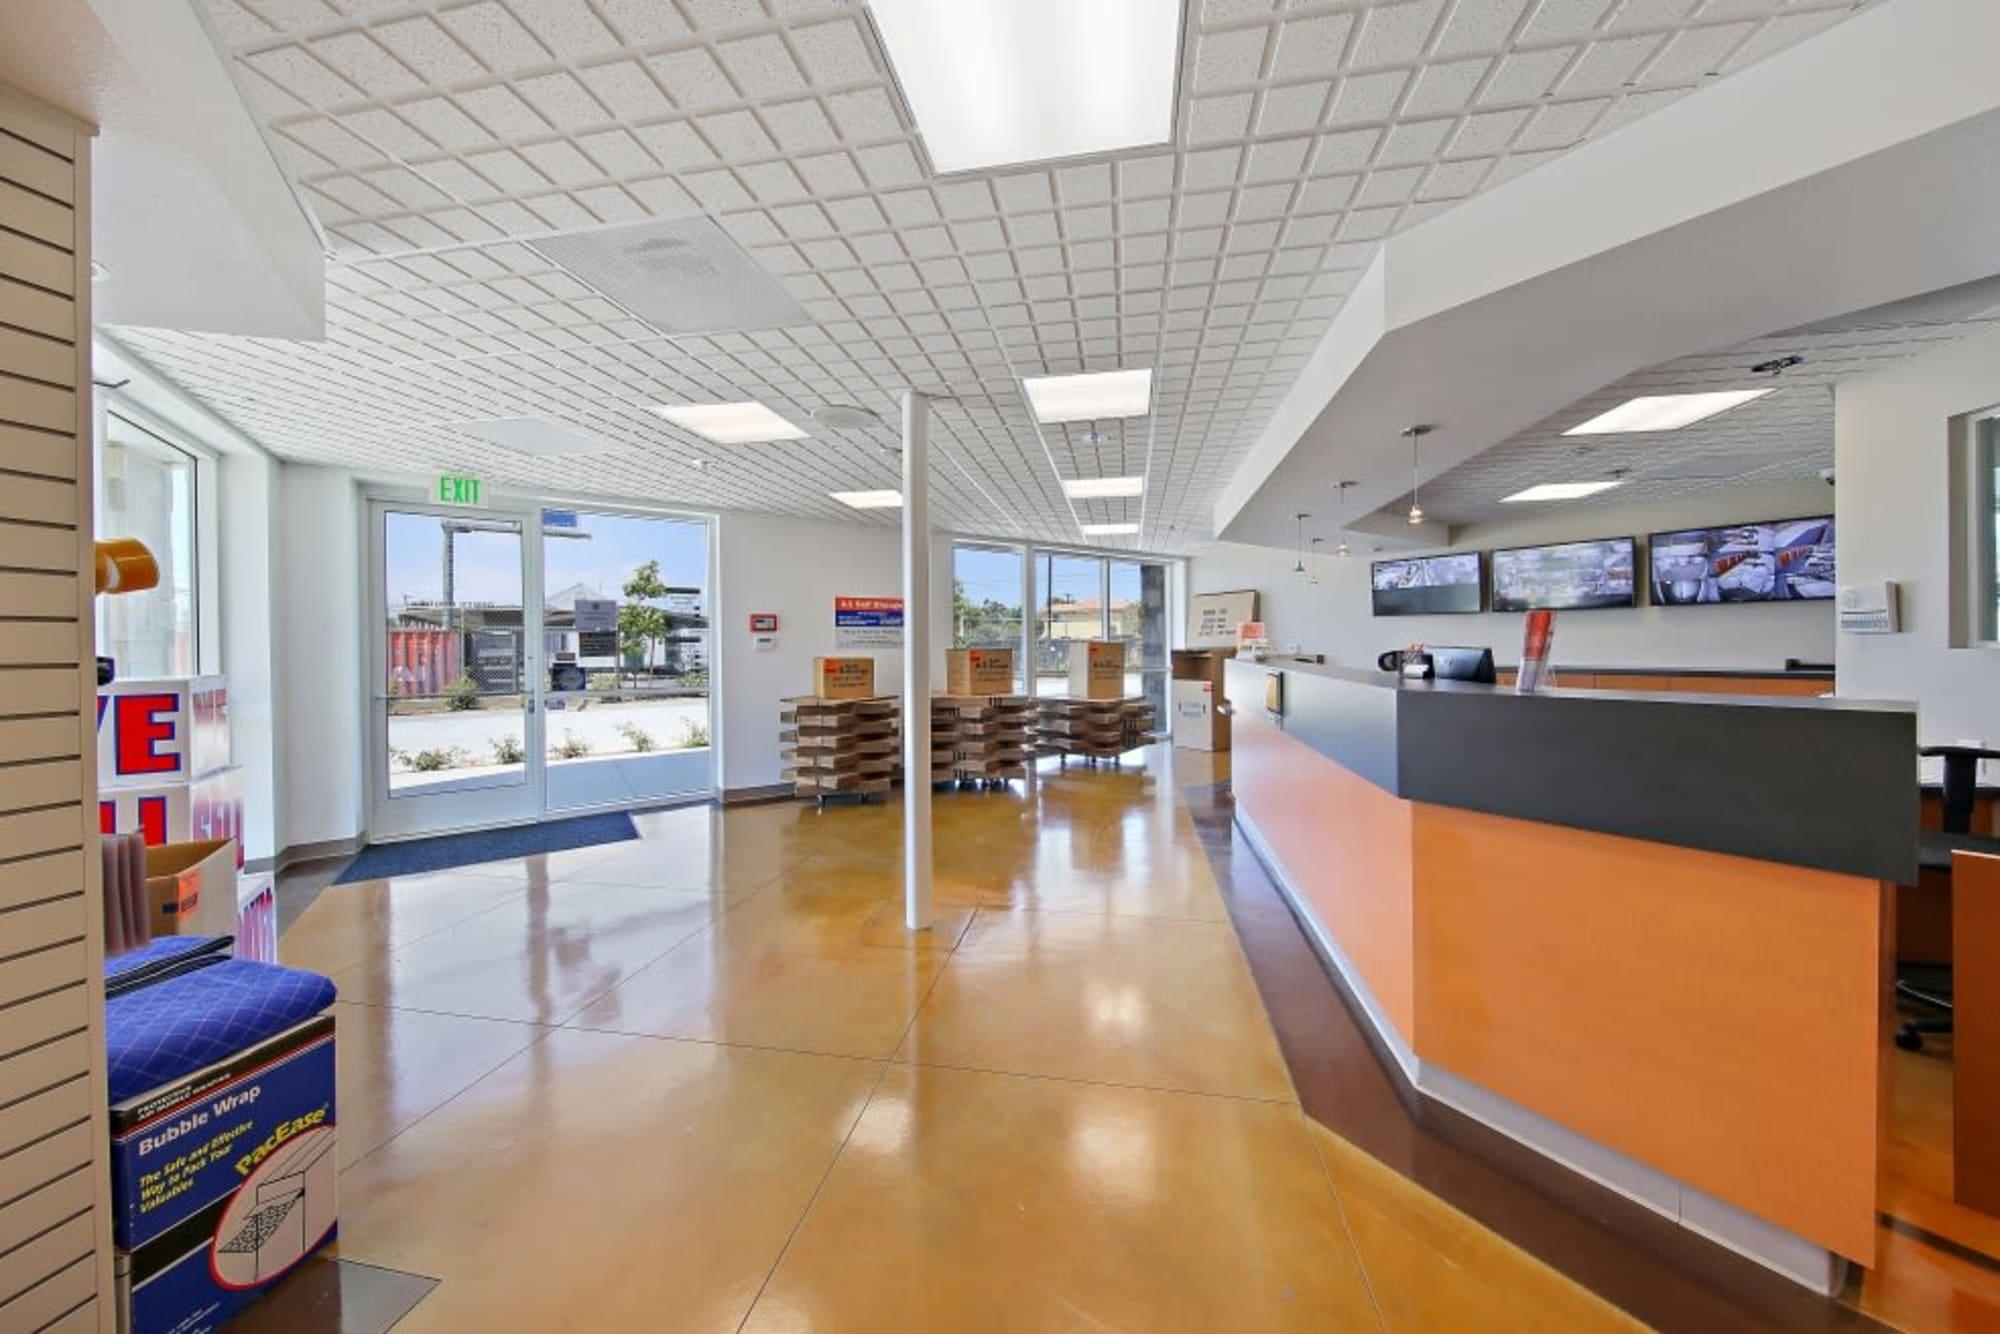 Customer service area at A-1 Self Storage in San Diego, California